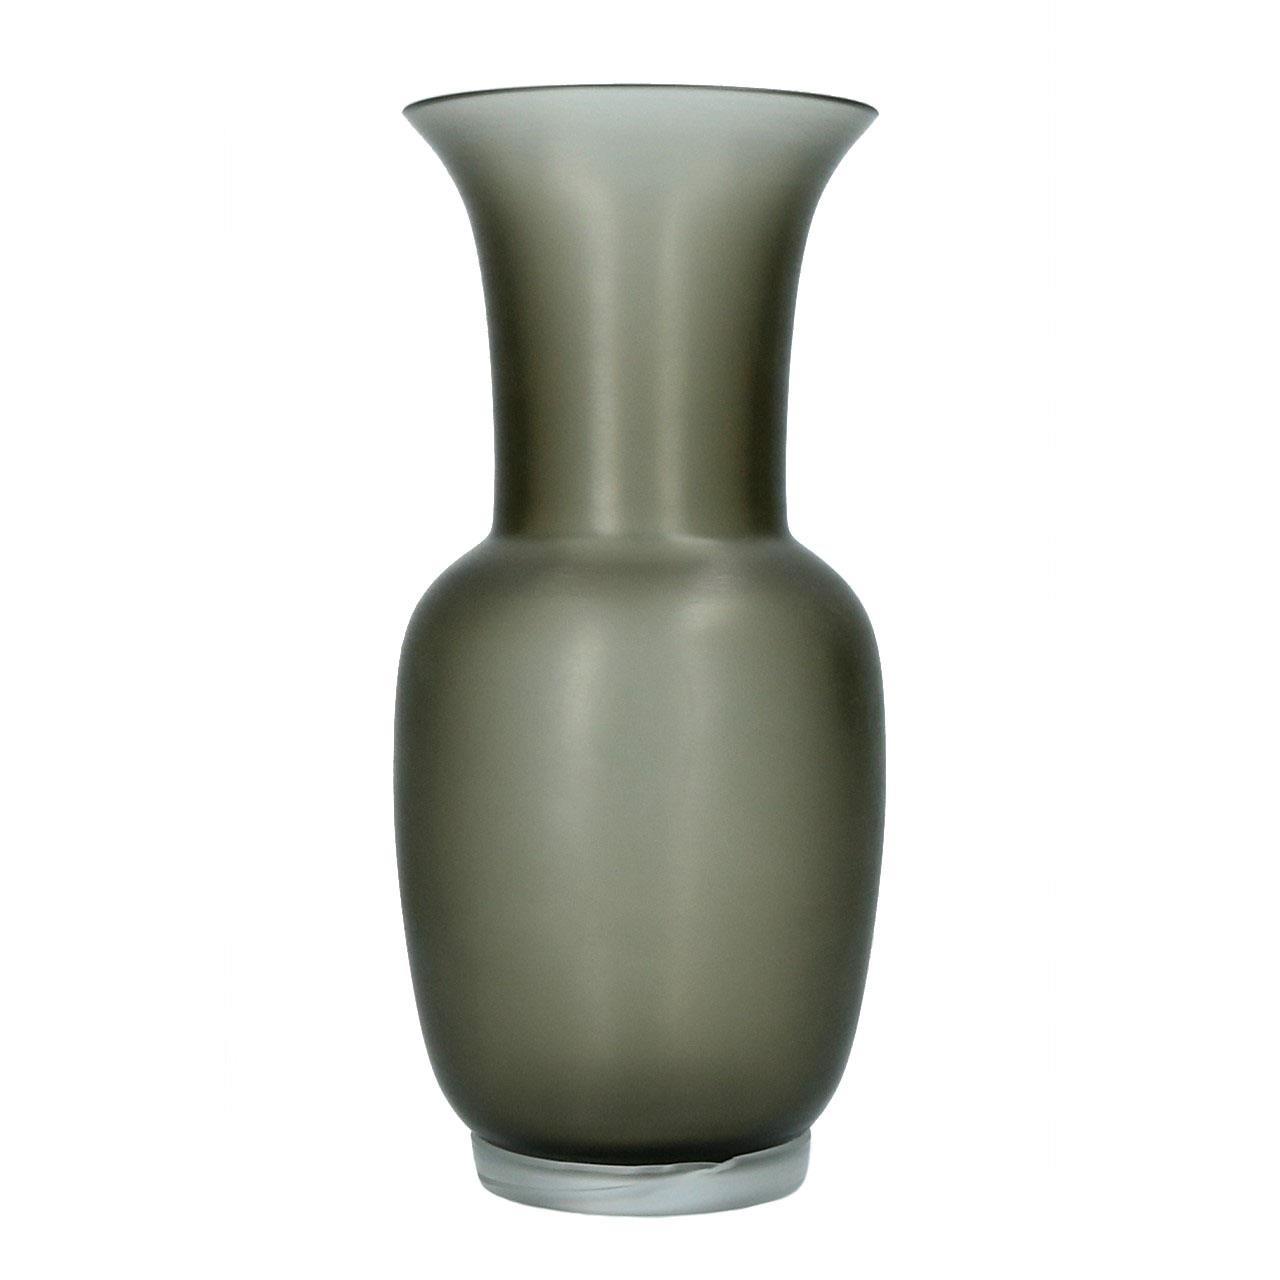 italian pottery vase of venini opalino vase 30 cm grey crystal satin franzen dac2bcsseldorf throughout venini opalino vase 30 cm grey crystal satin franzen dac2bcsseldorf onlineshop